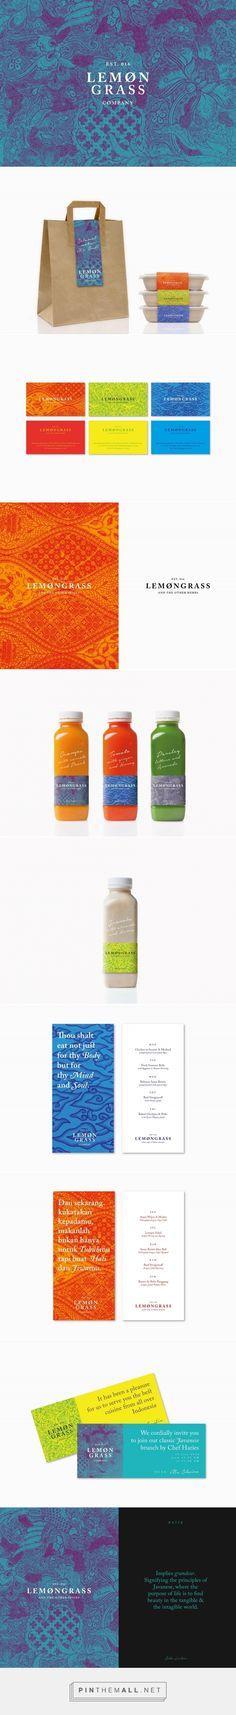 Lemongrass Company